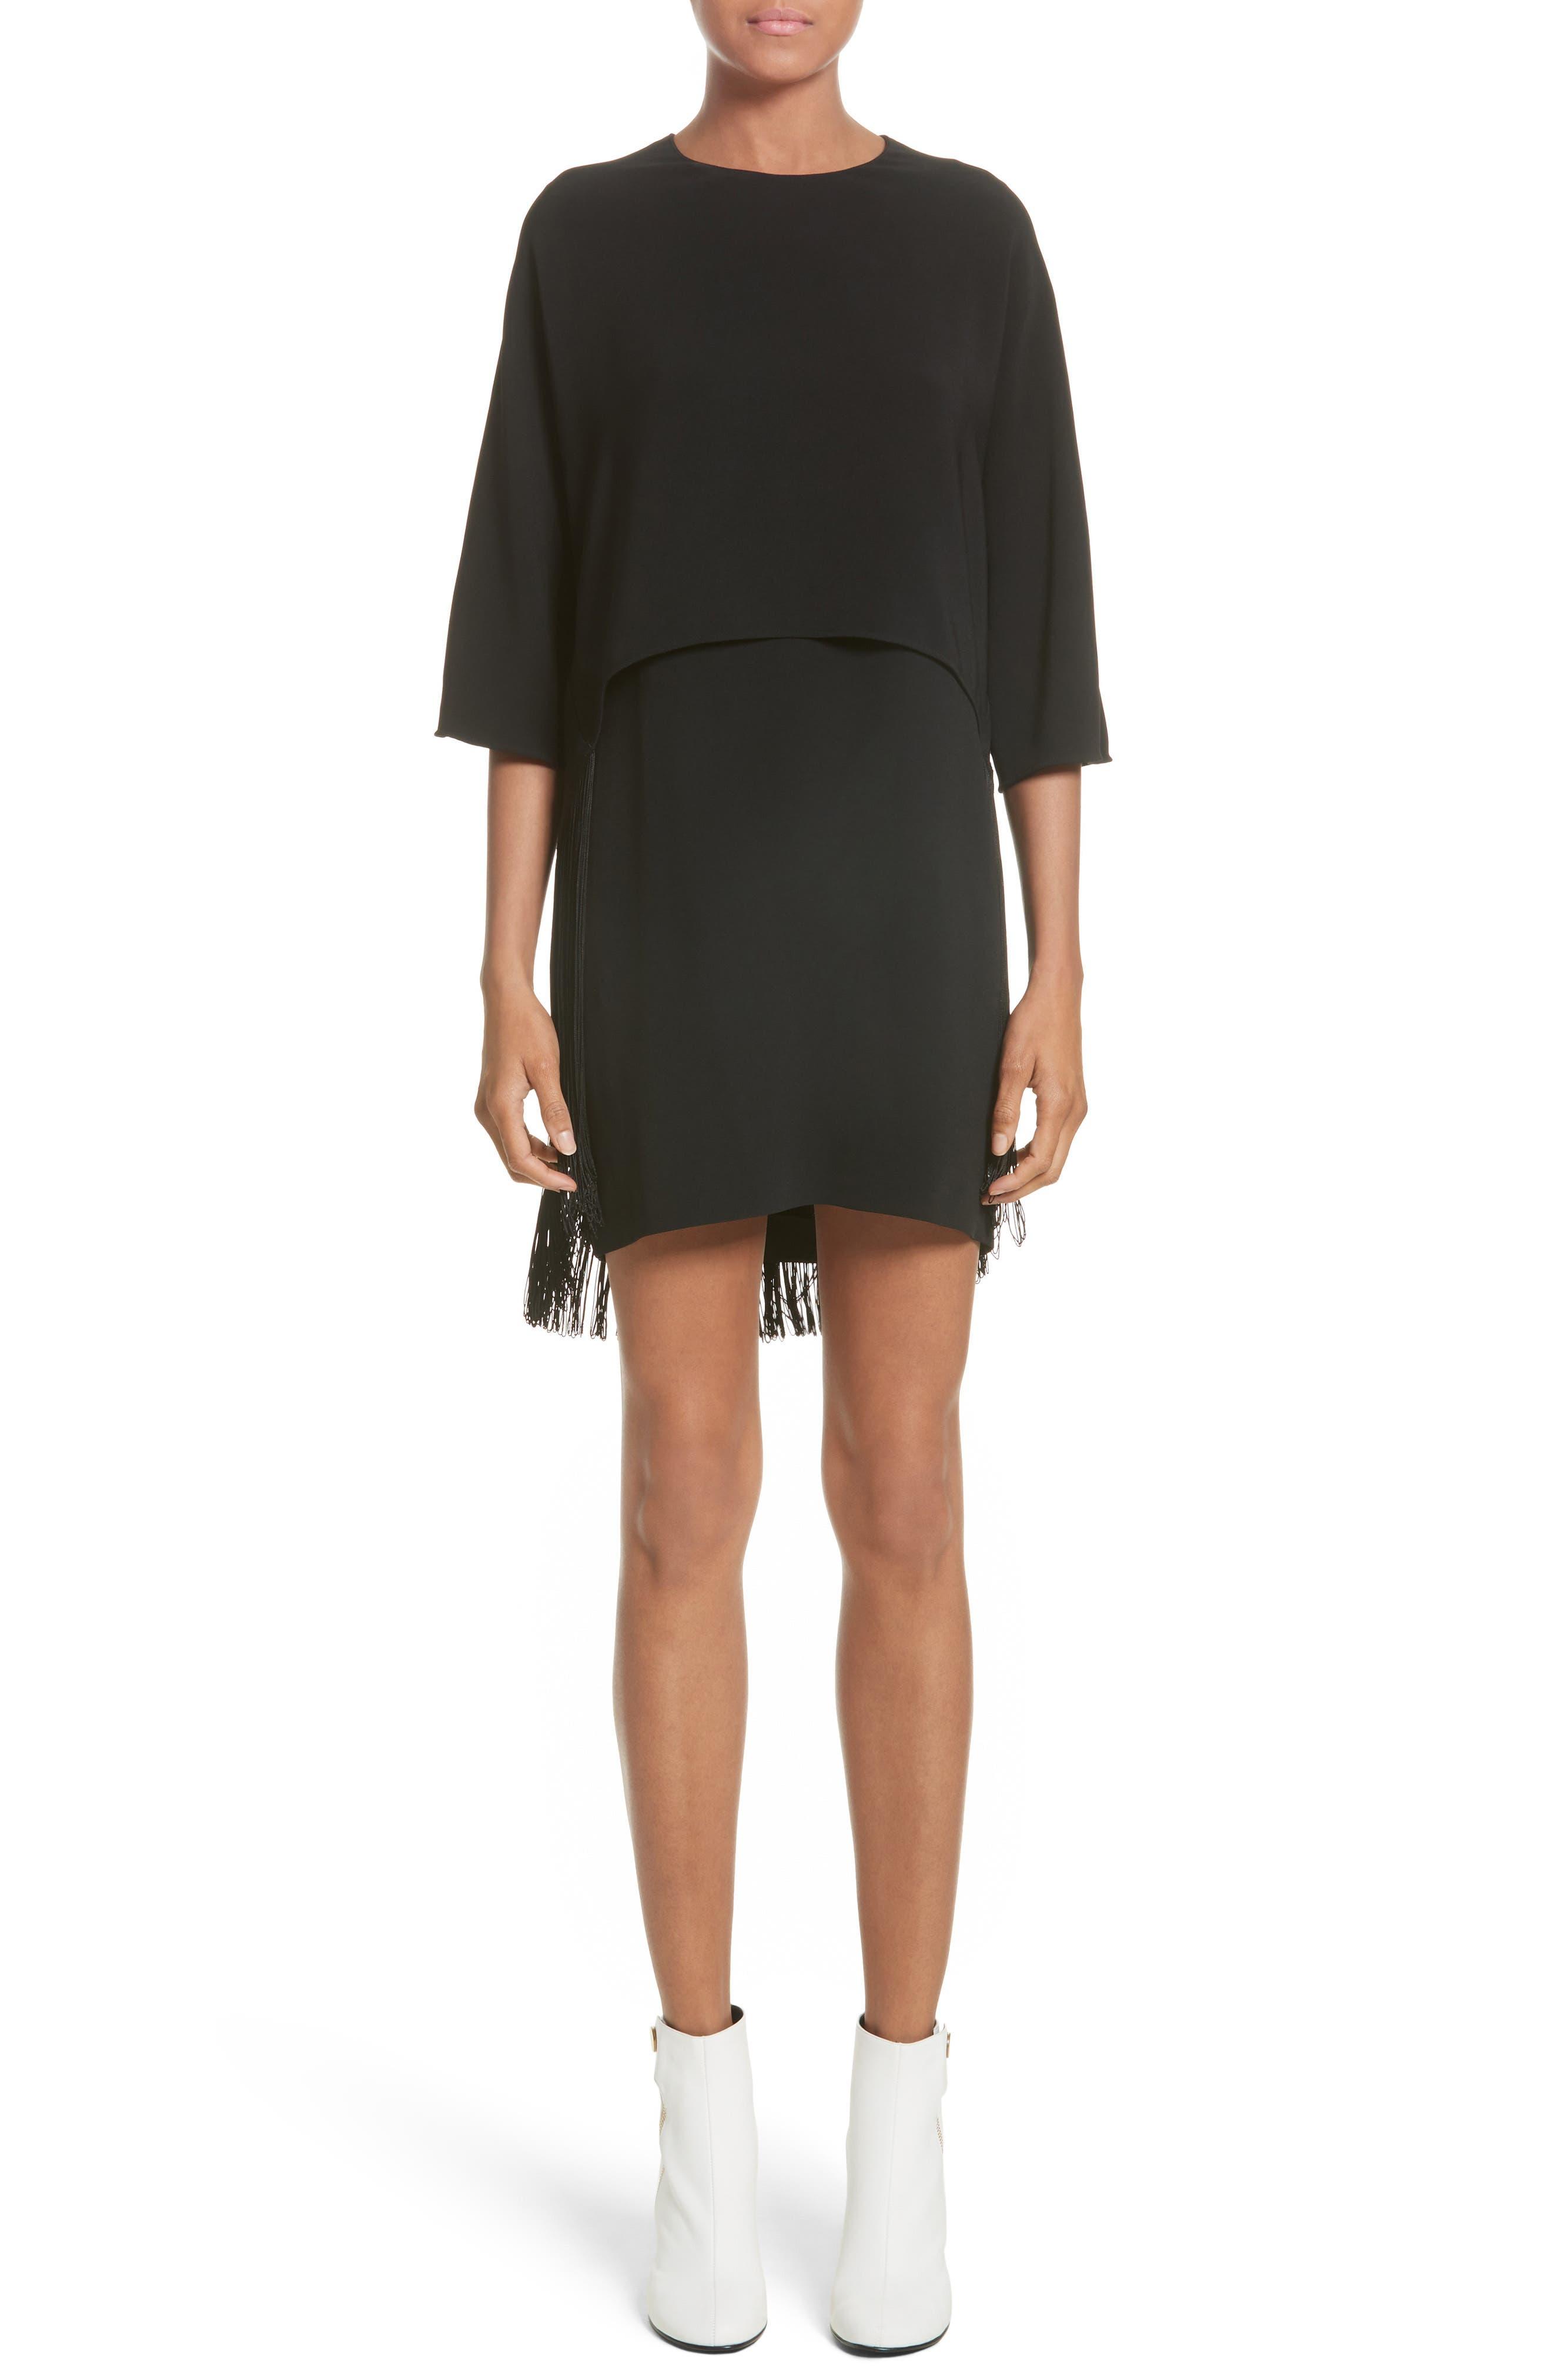 Alternate Image 1 Selected - Stella McCartney Fringe Overlay Stretch Cady Dress